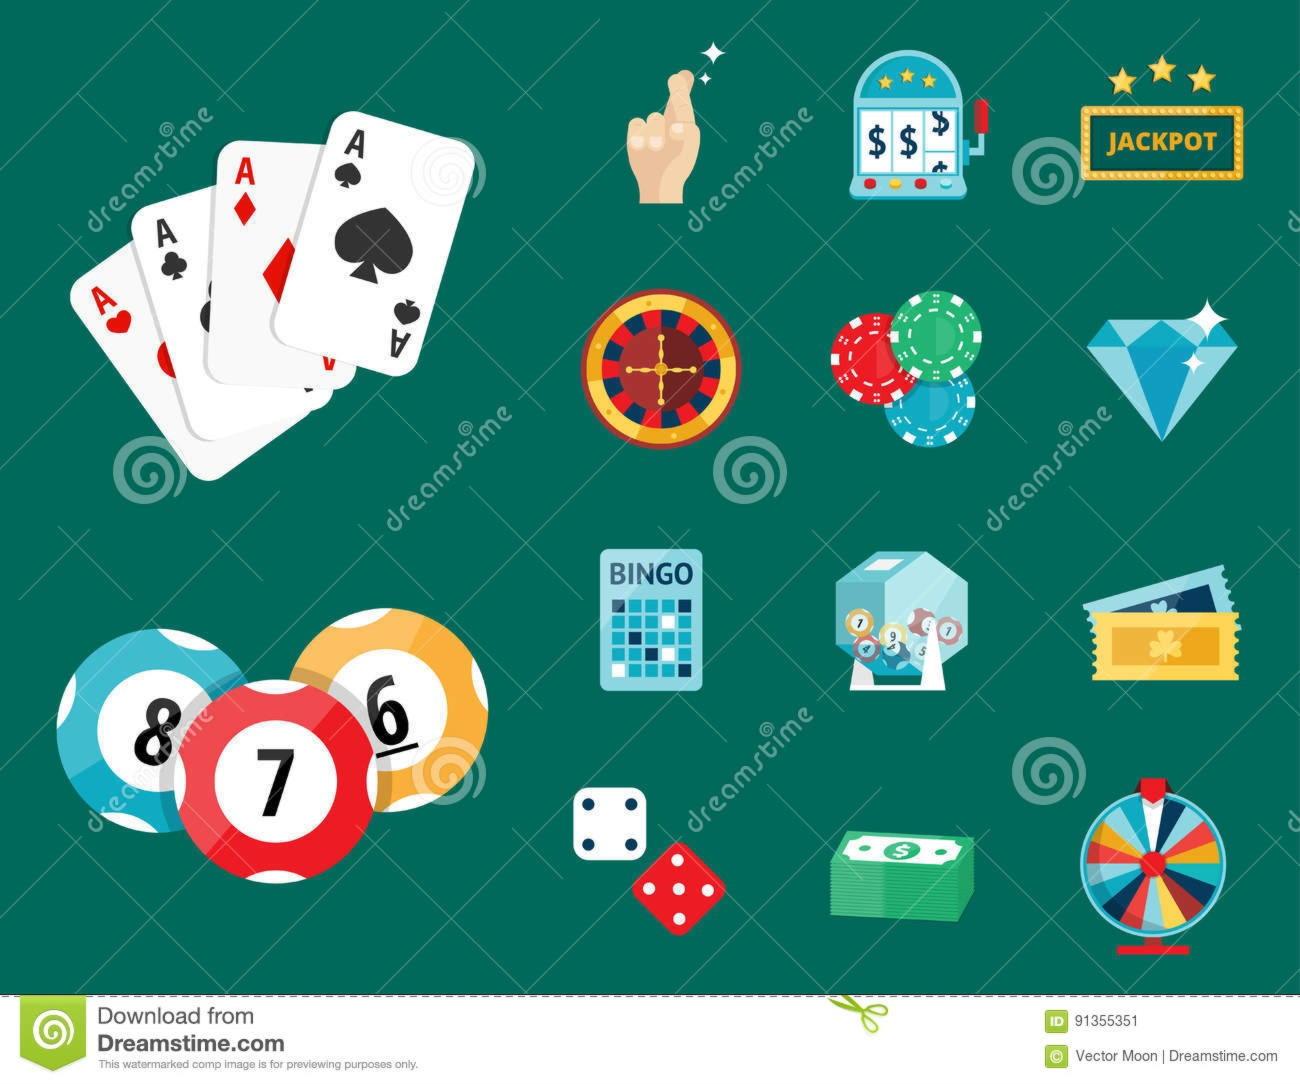 Poker Noxda 30 Free Spins hech qanday omonatli pul kazino